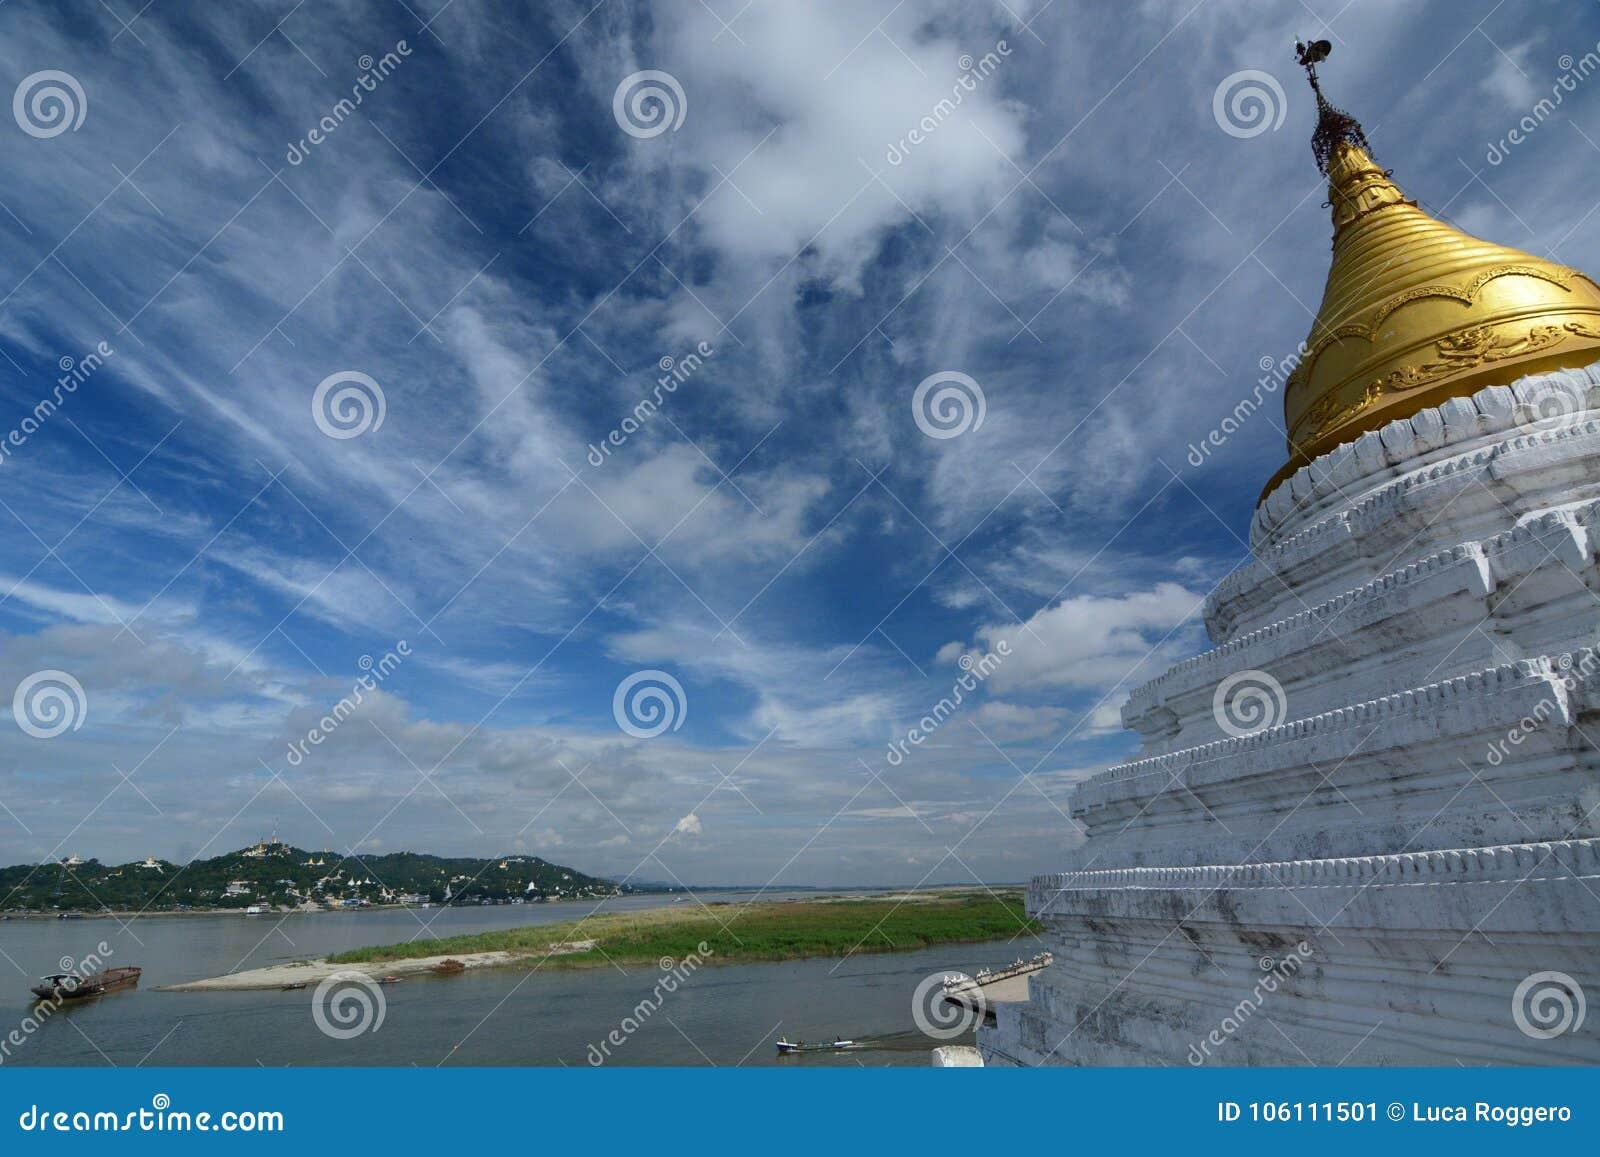 Fiume di Irrawaddy e vista della collina di Sagaing dalla pagoda di Shwe-kyet-kya mandalay myanmar